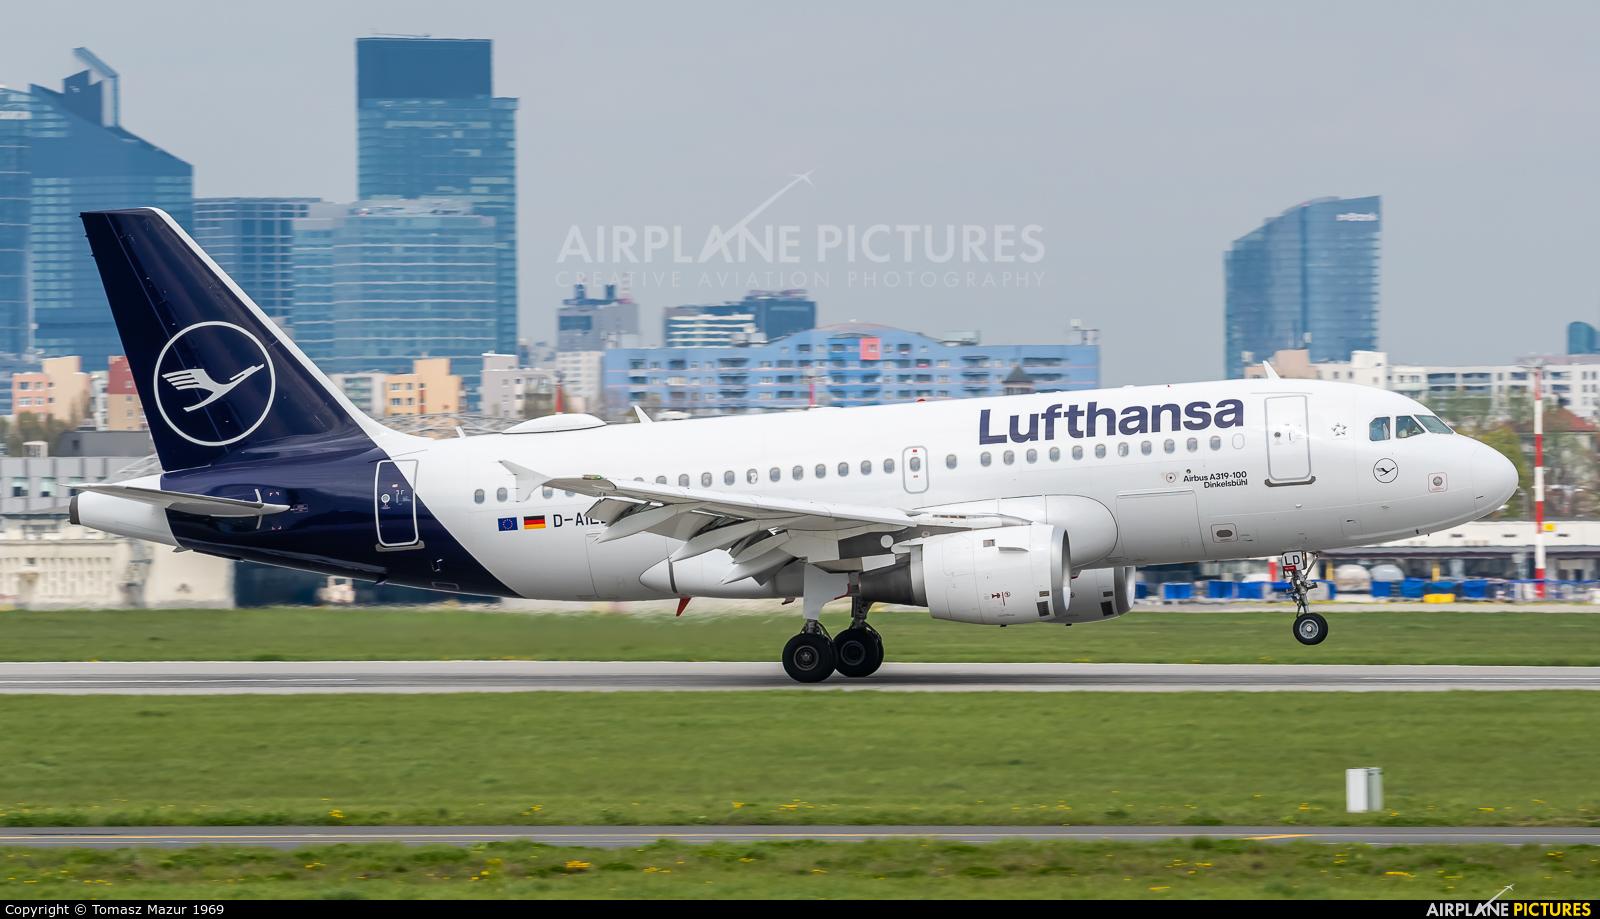 Lufthansa D-AILD aircraft at Warsaw - Frederic Chopin